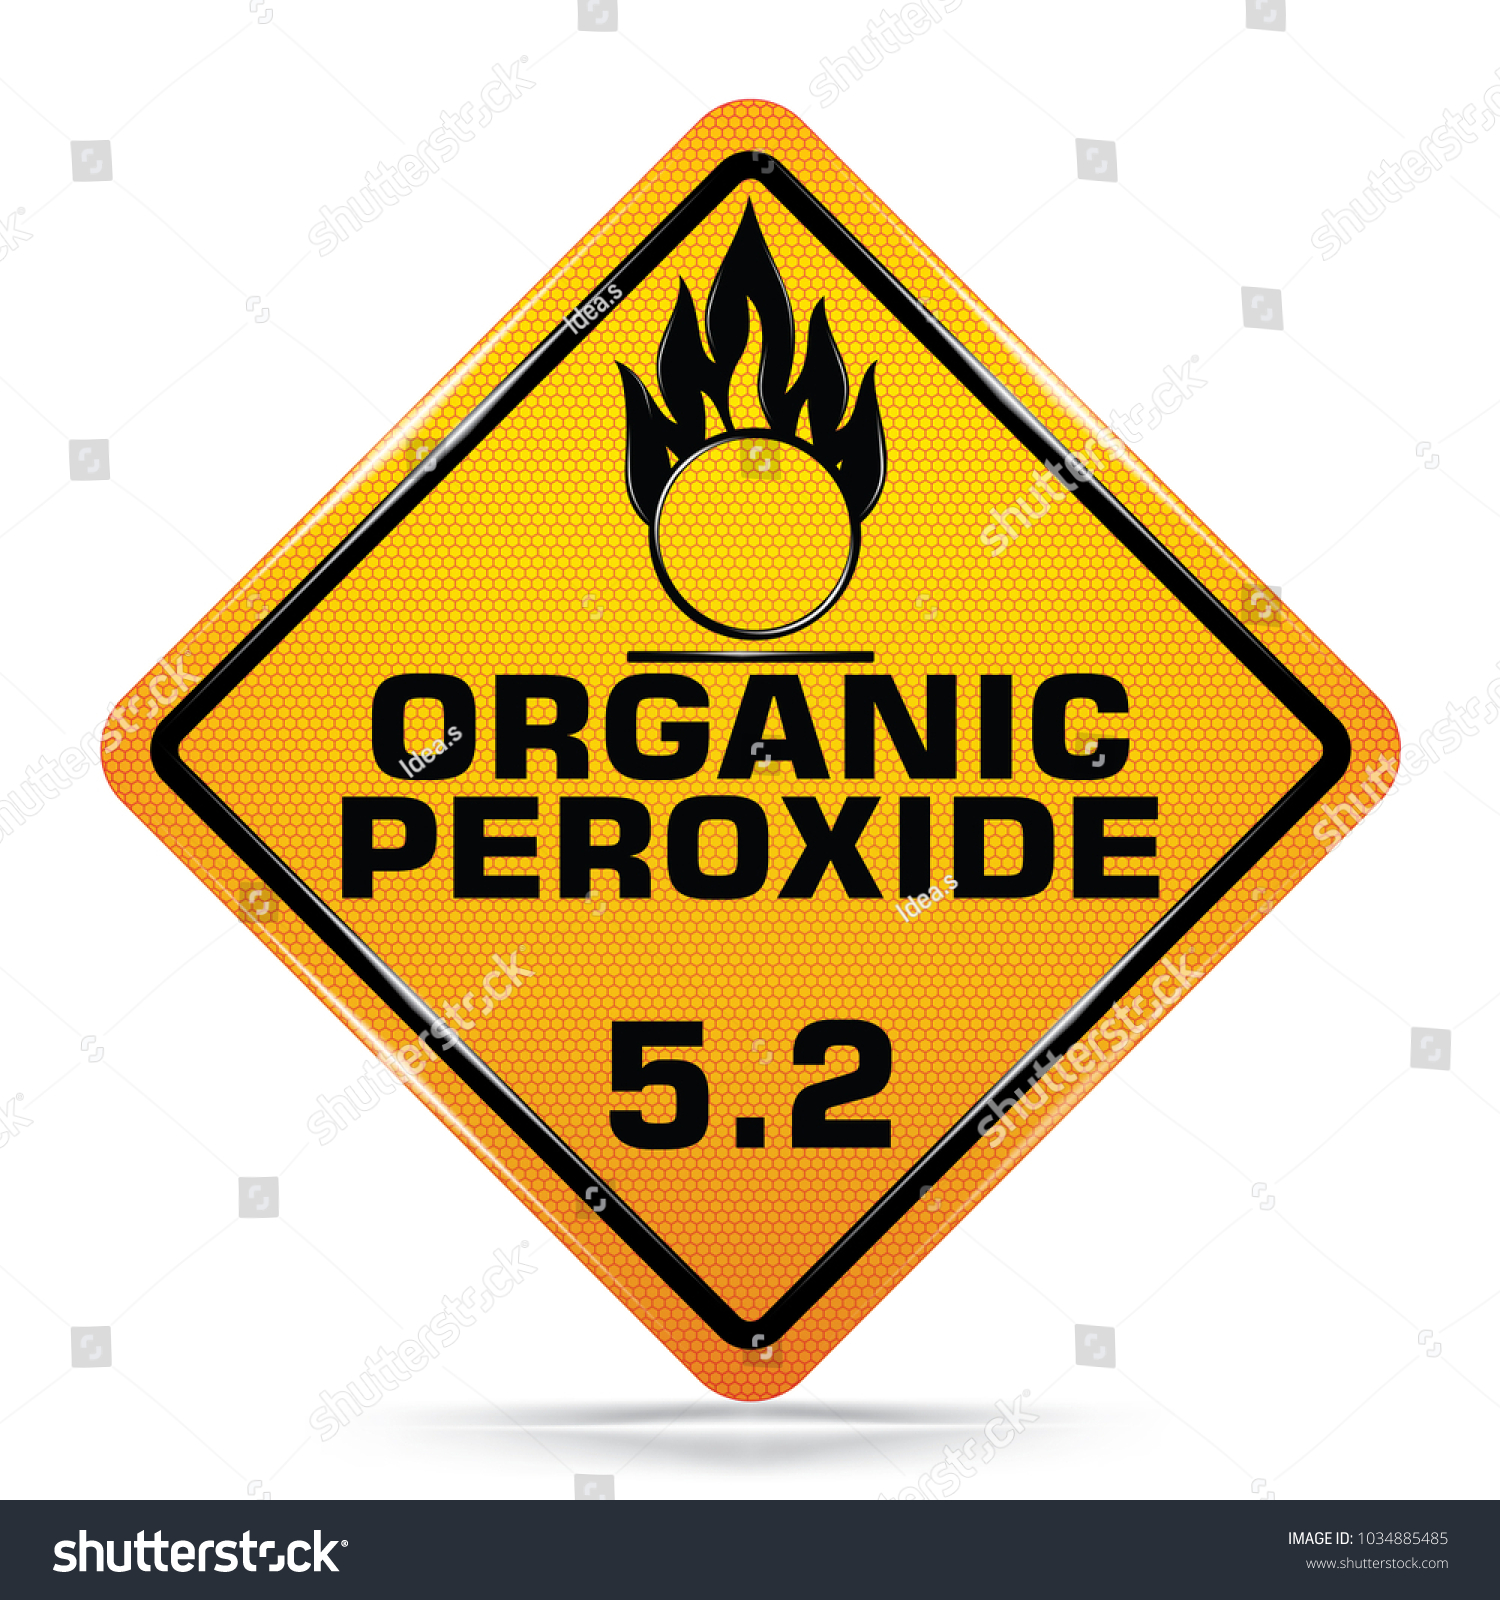 Organic peroxide symbol images symbol and sign ideas international organic peroxide class 52 sign stock vector international organic peroxide class 52 sign symbol isolated buycottarizona